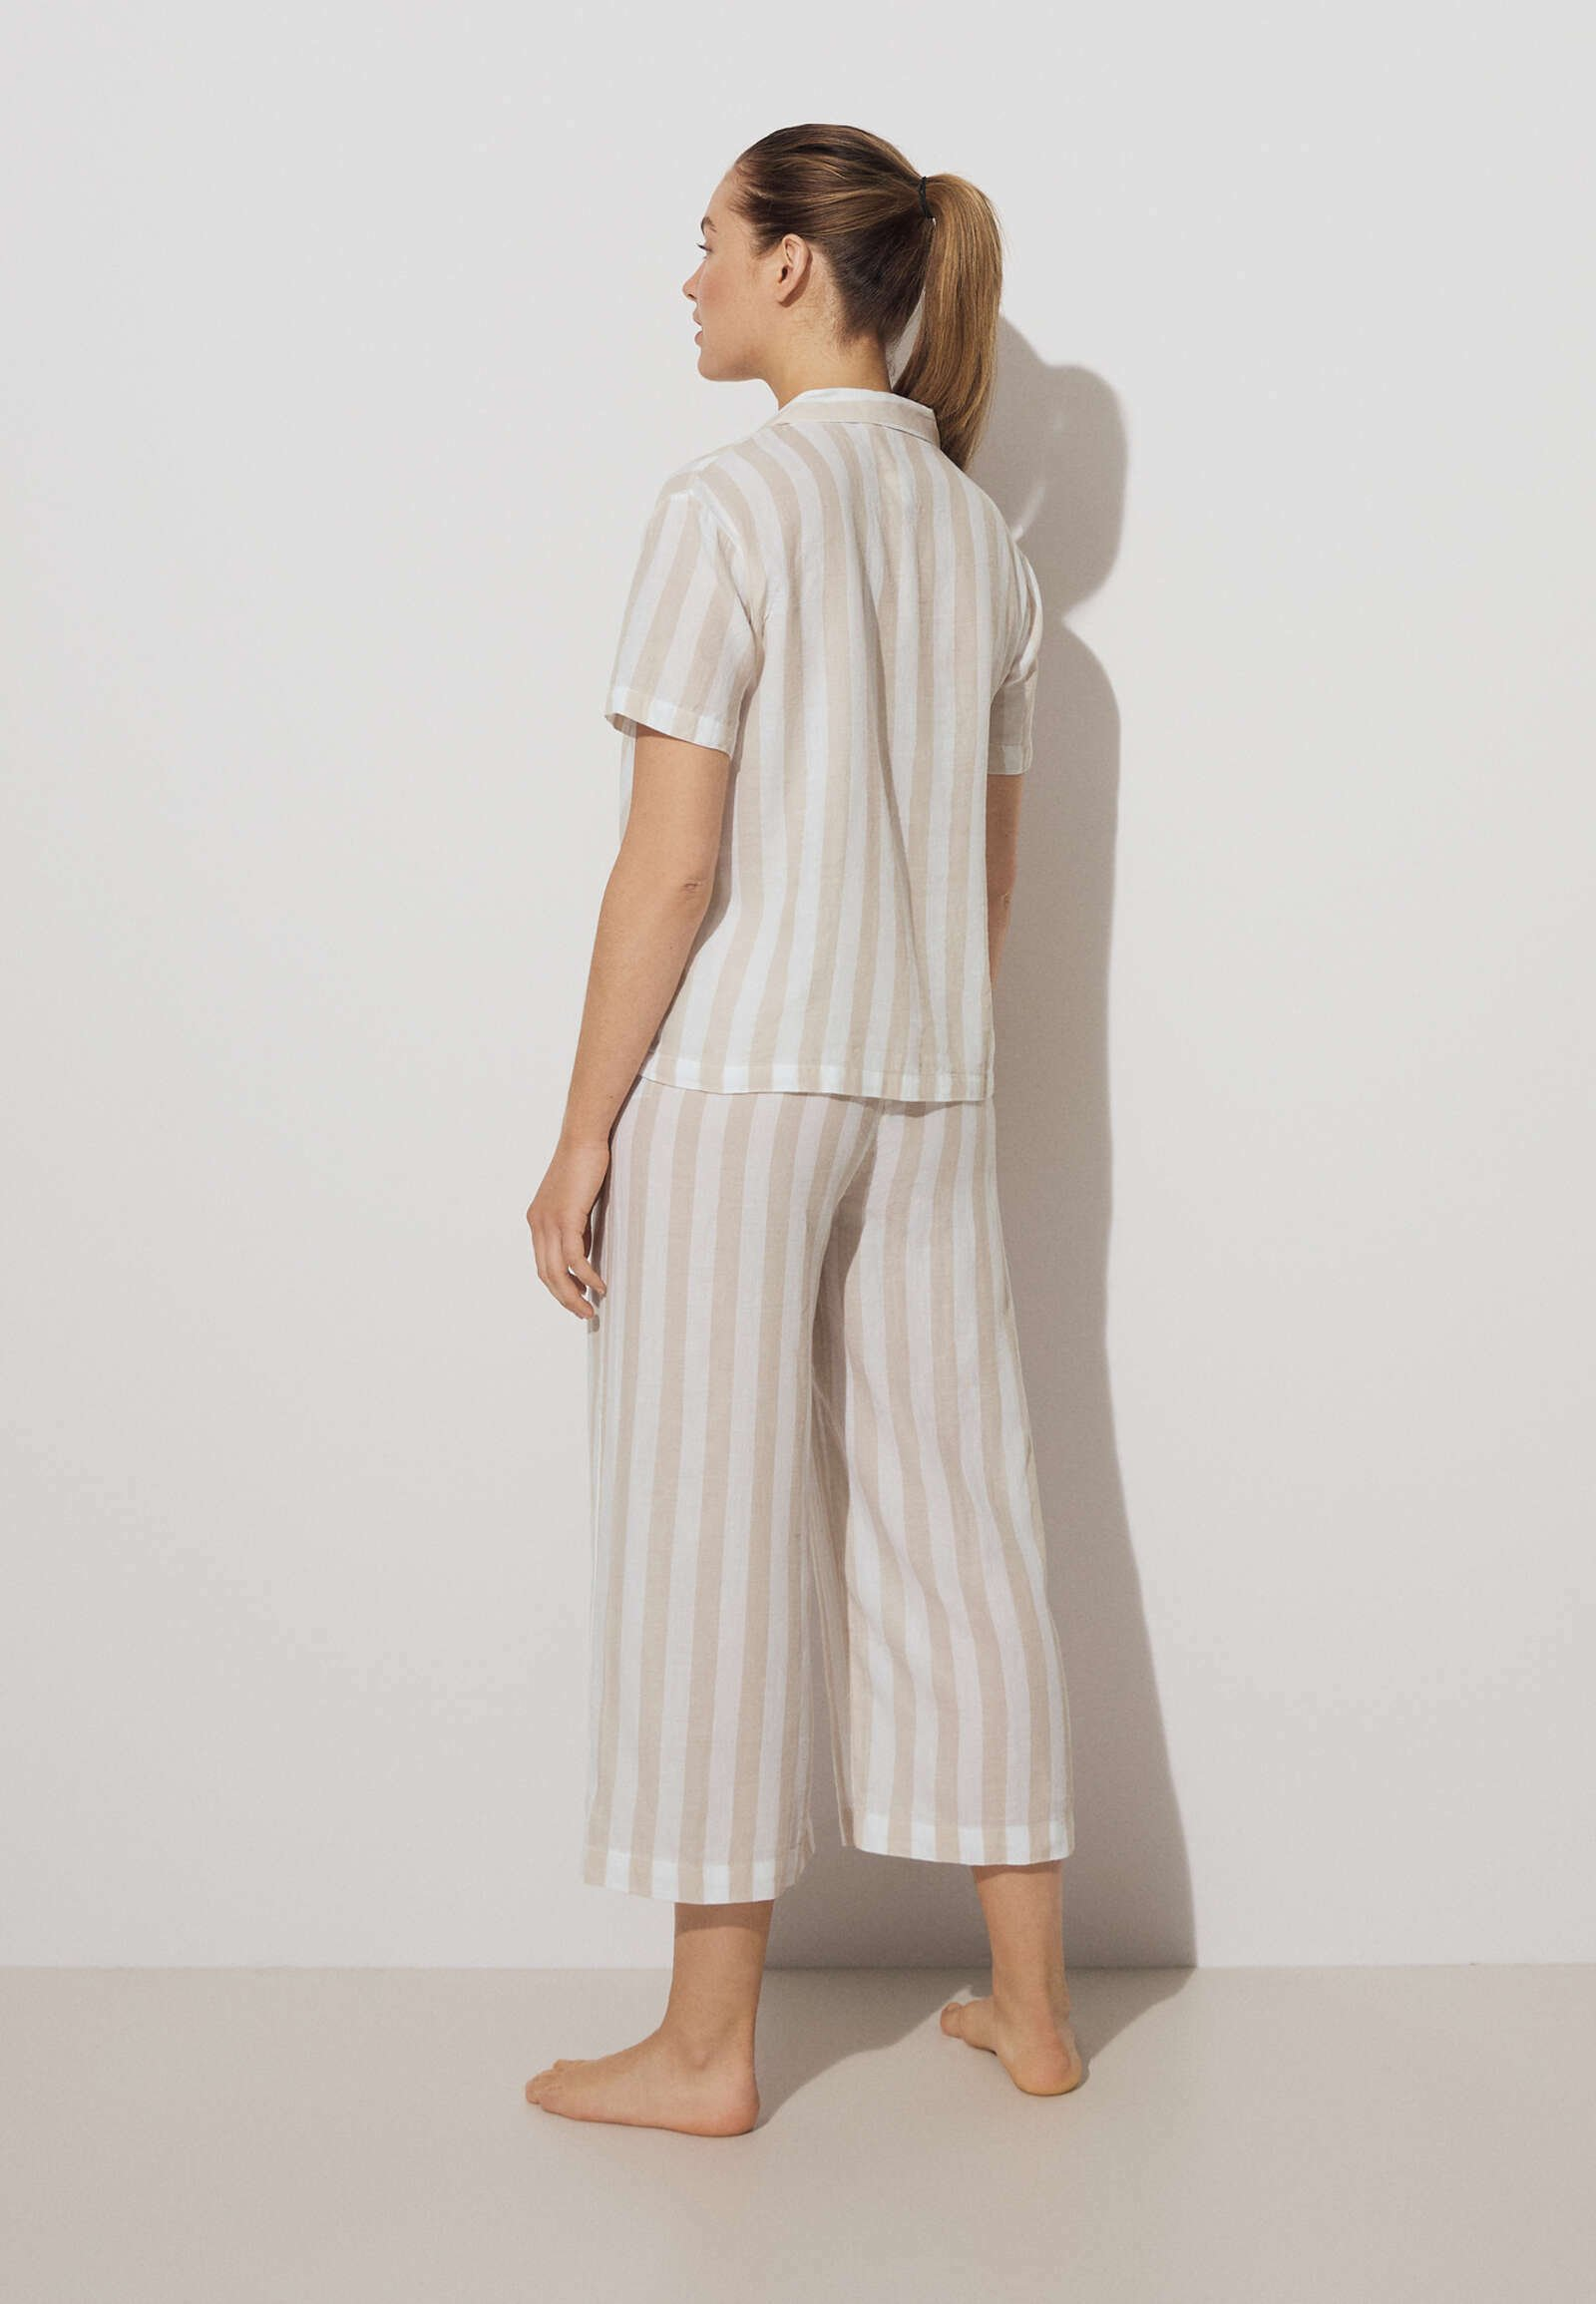 Damen OAT - Nachtwäsche Hose